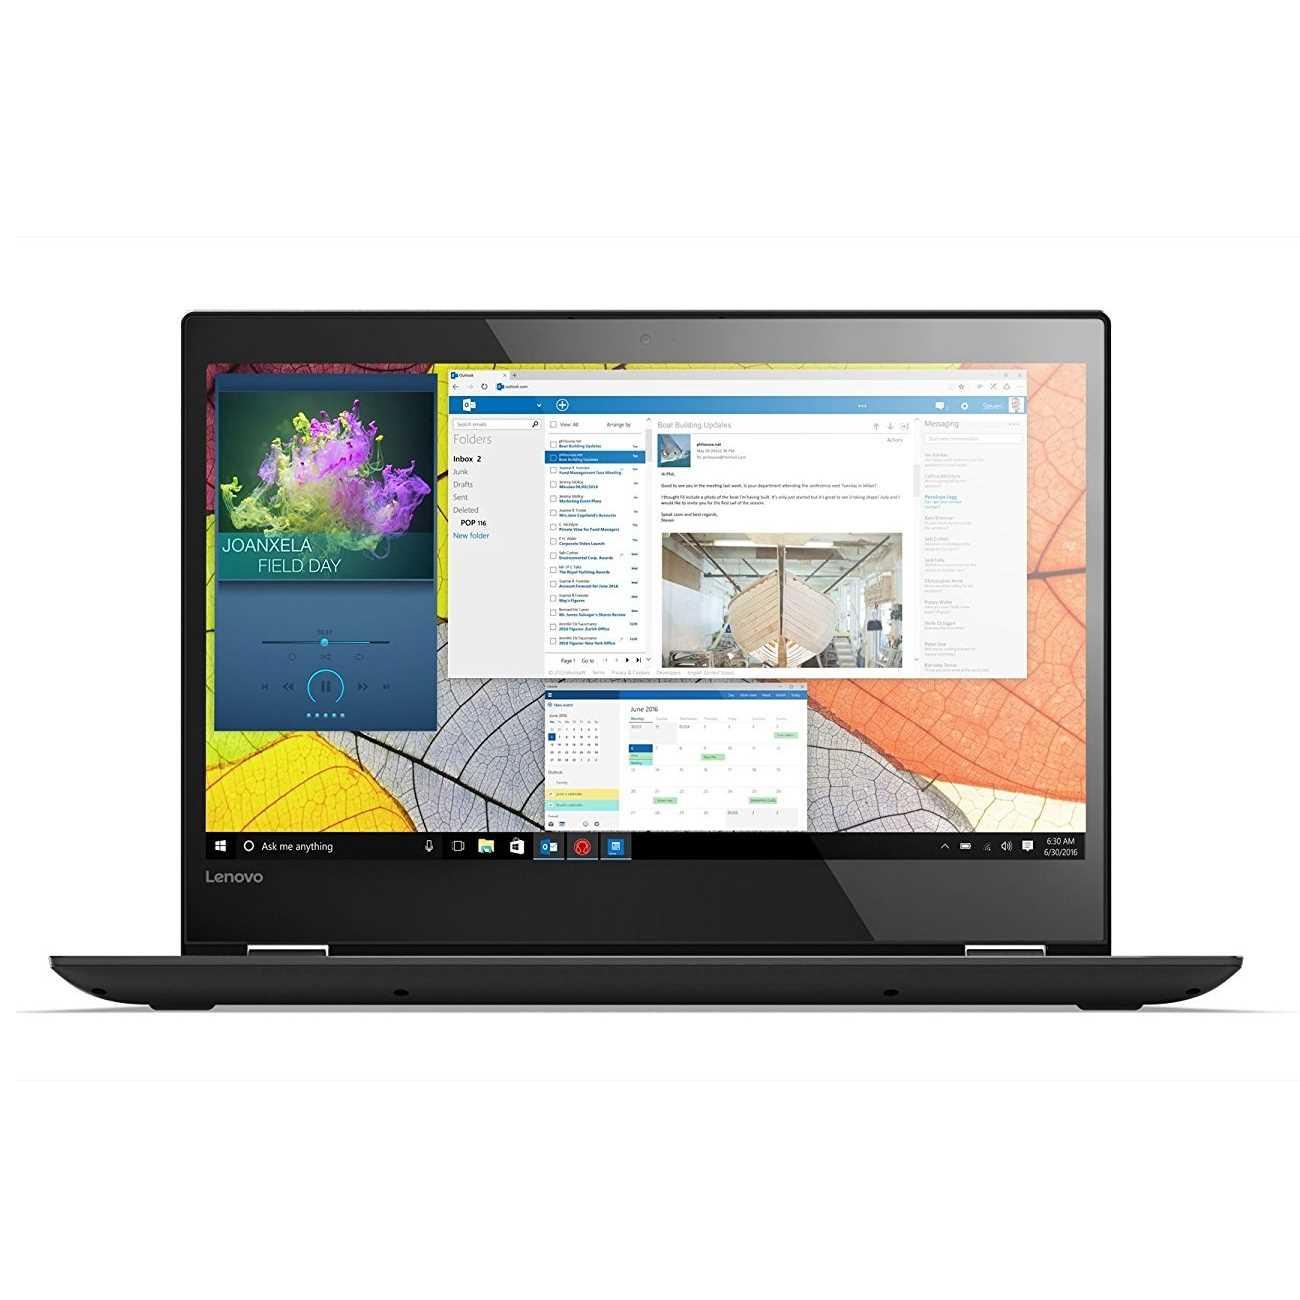 Lenovo Yoga 520 (80X800Q7IN) Laptop